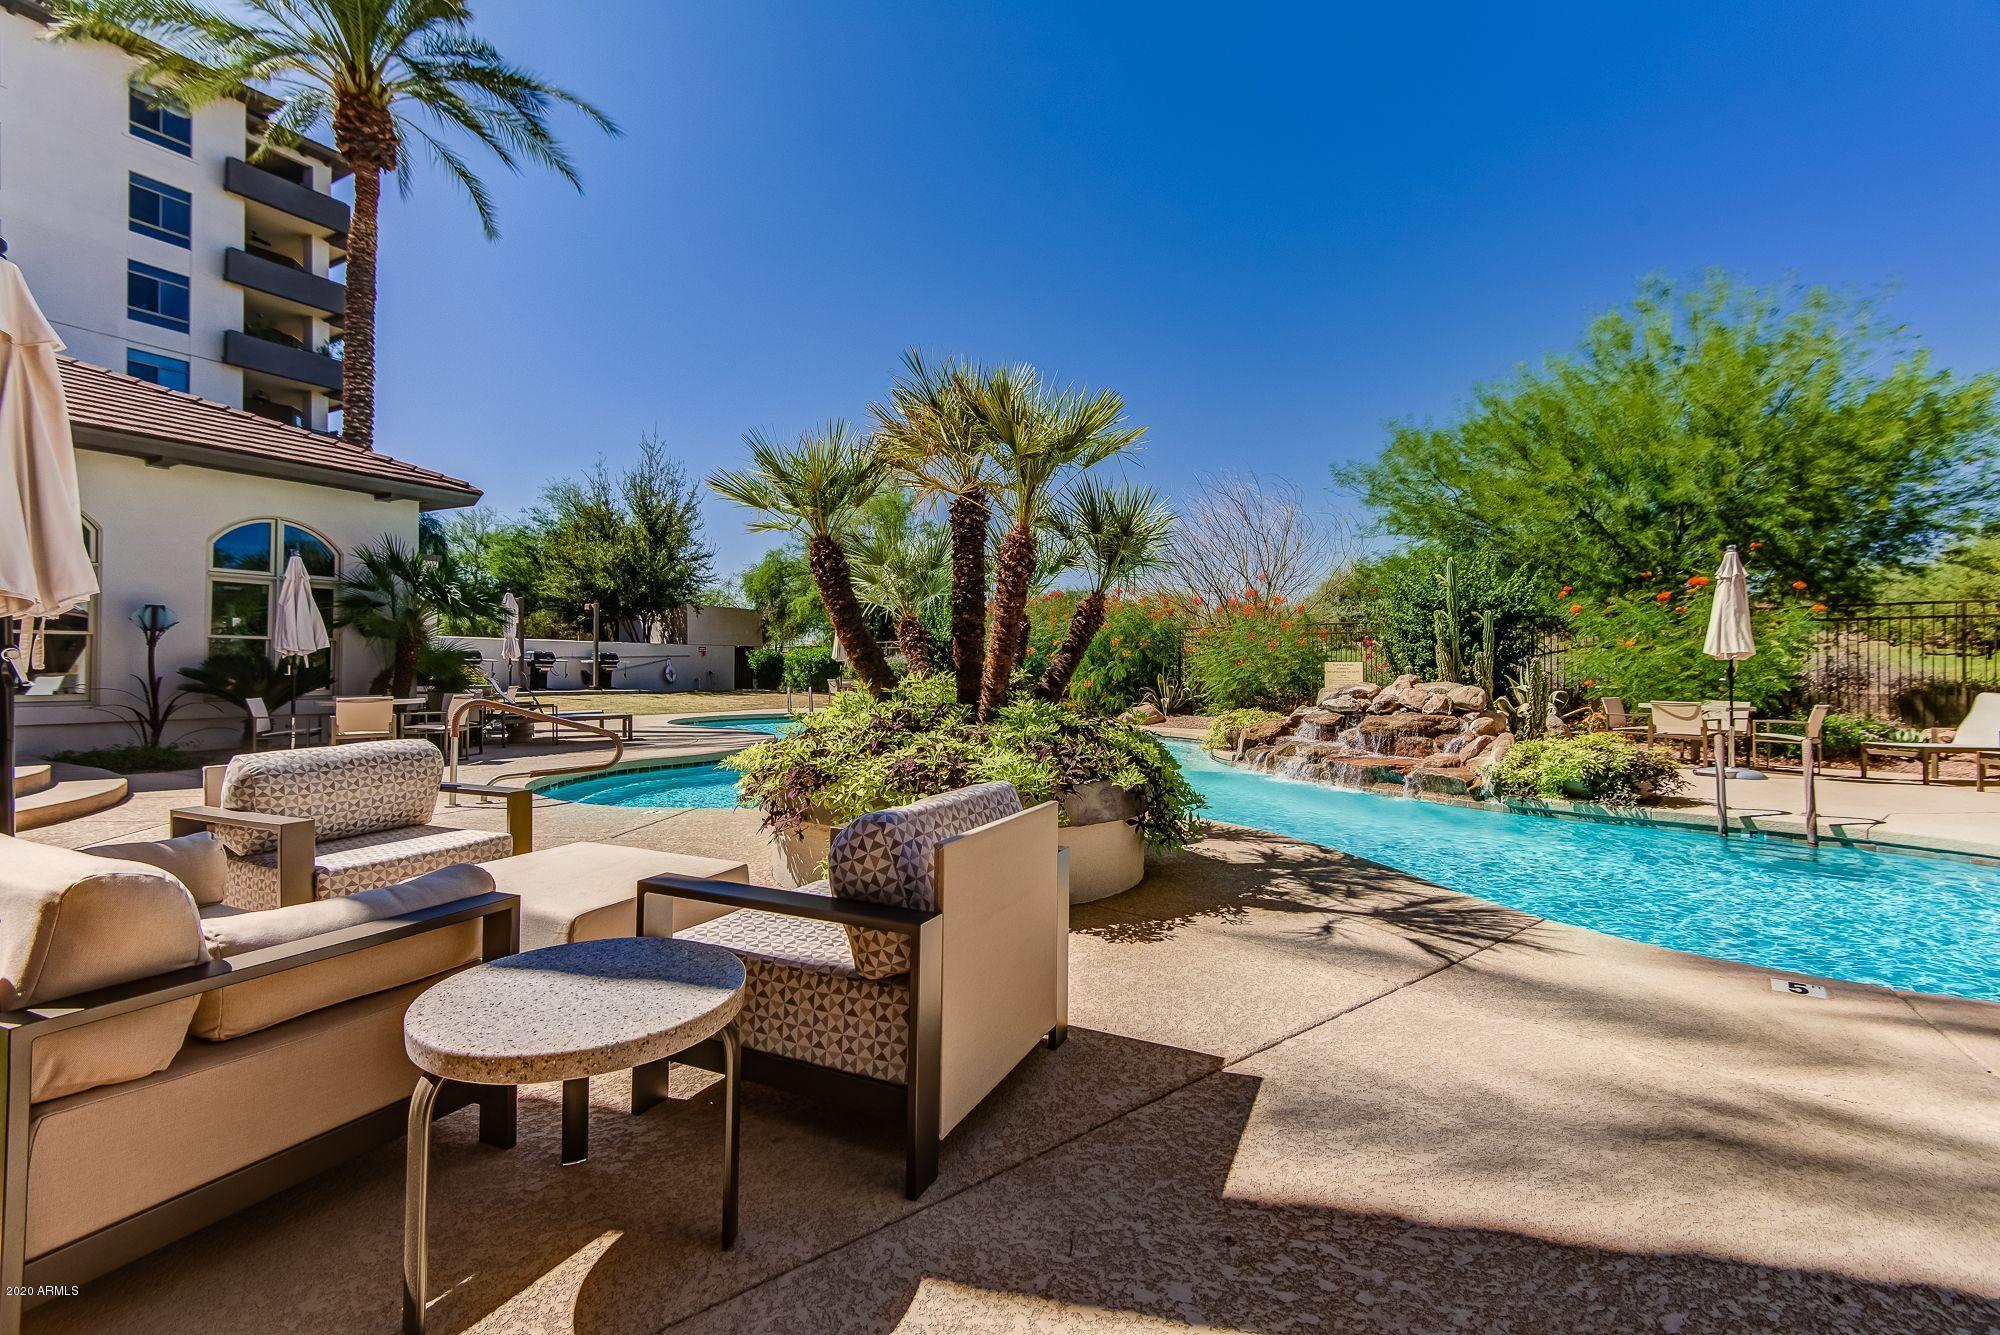 MLS 6140835 15802 N 71ST Street Unit 313, Scottsdale, AZ 85254 Scottsdale AZ The Landmark